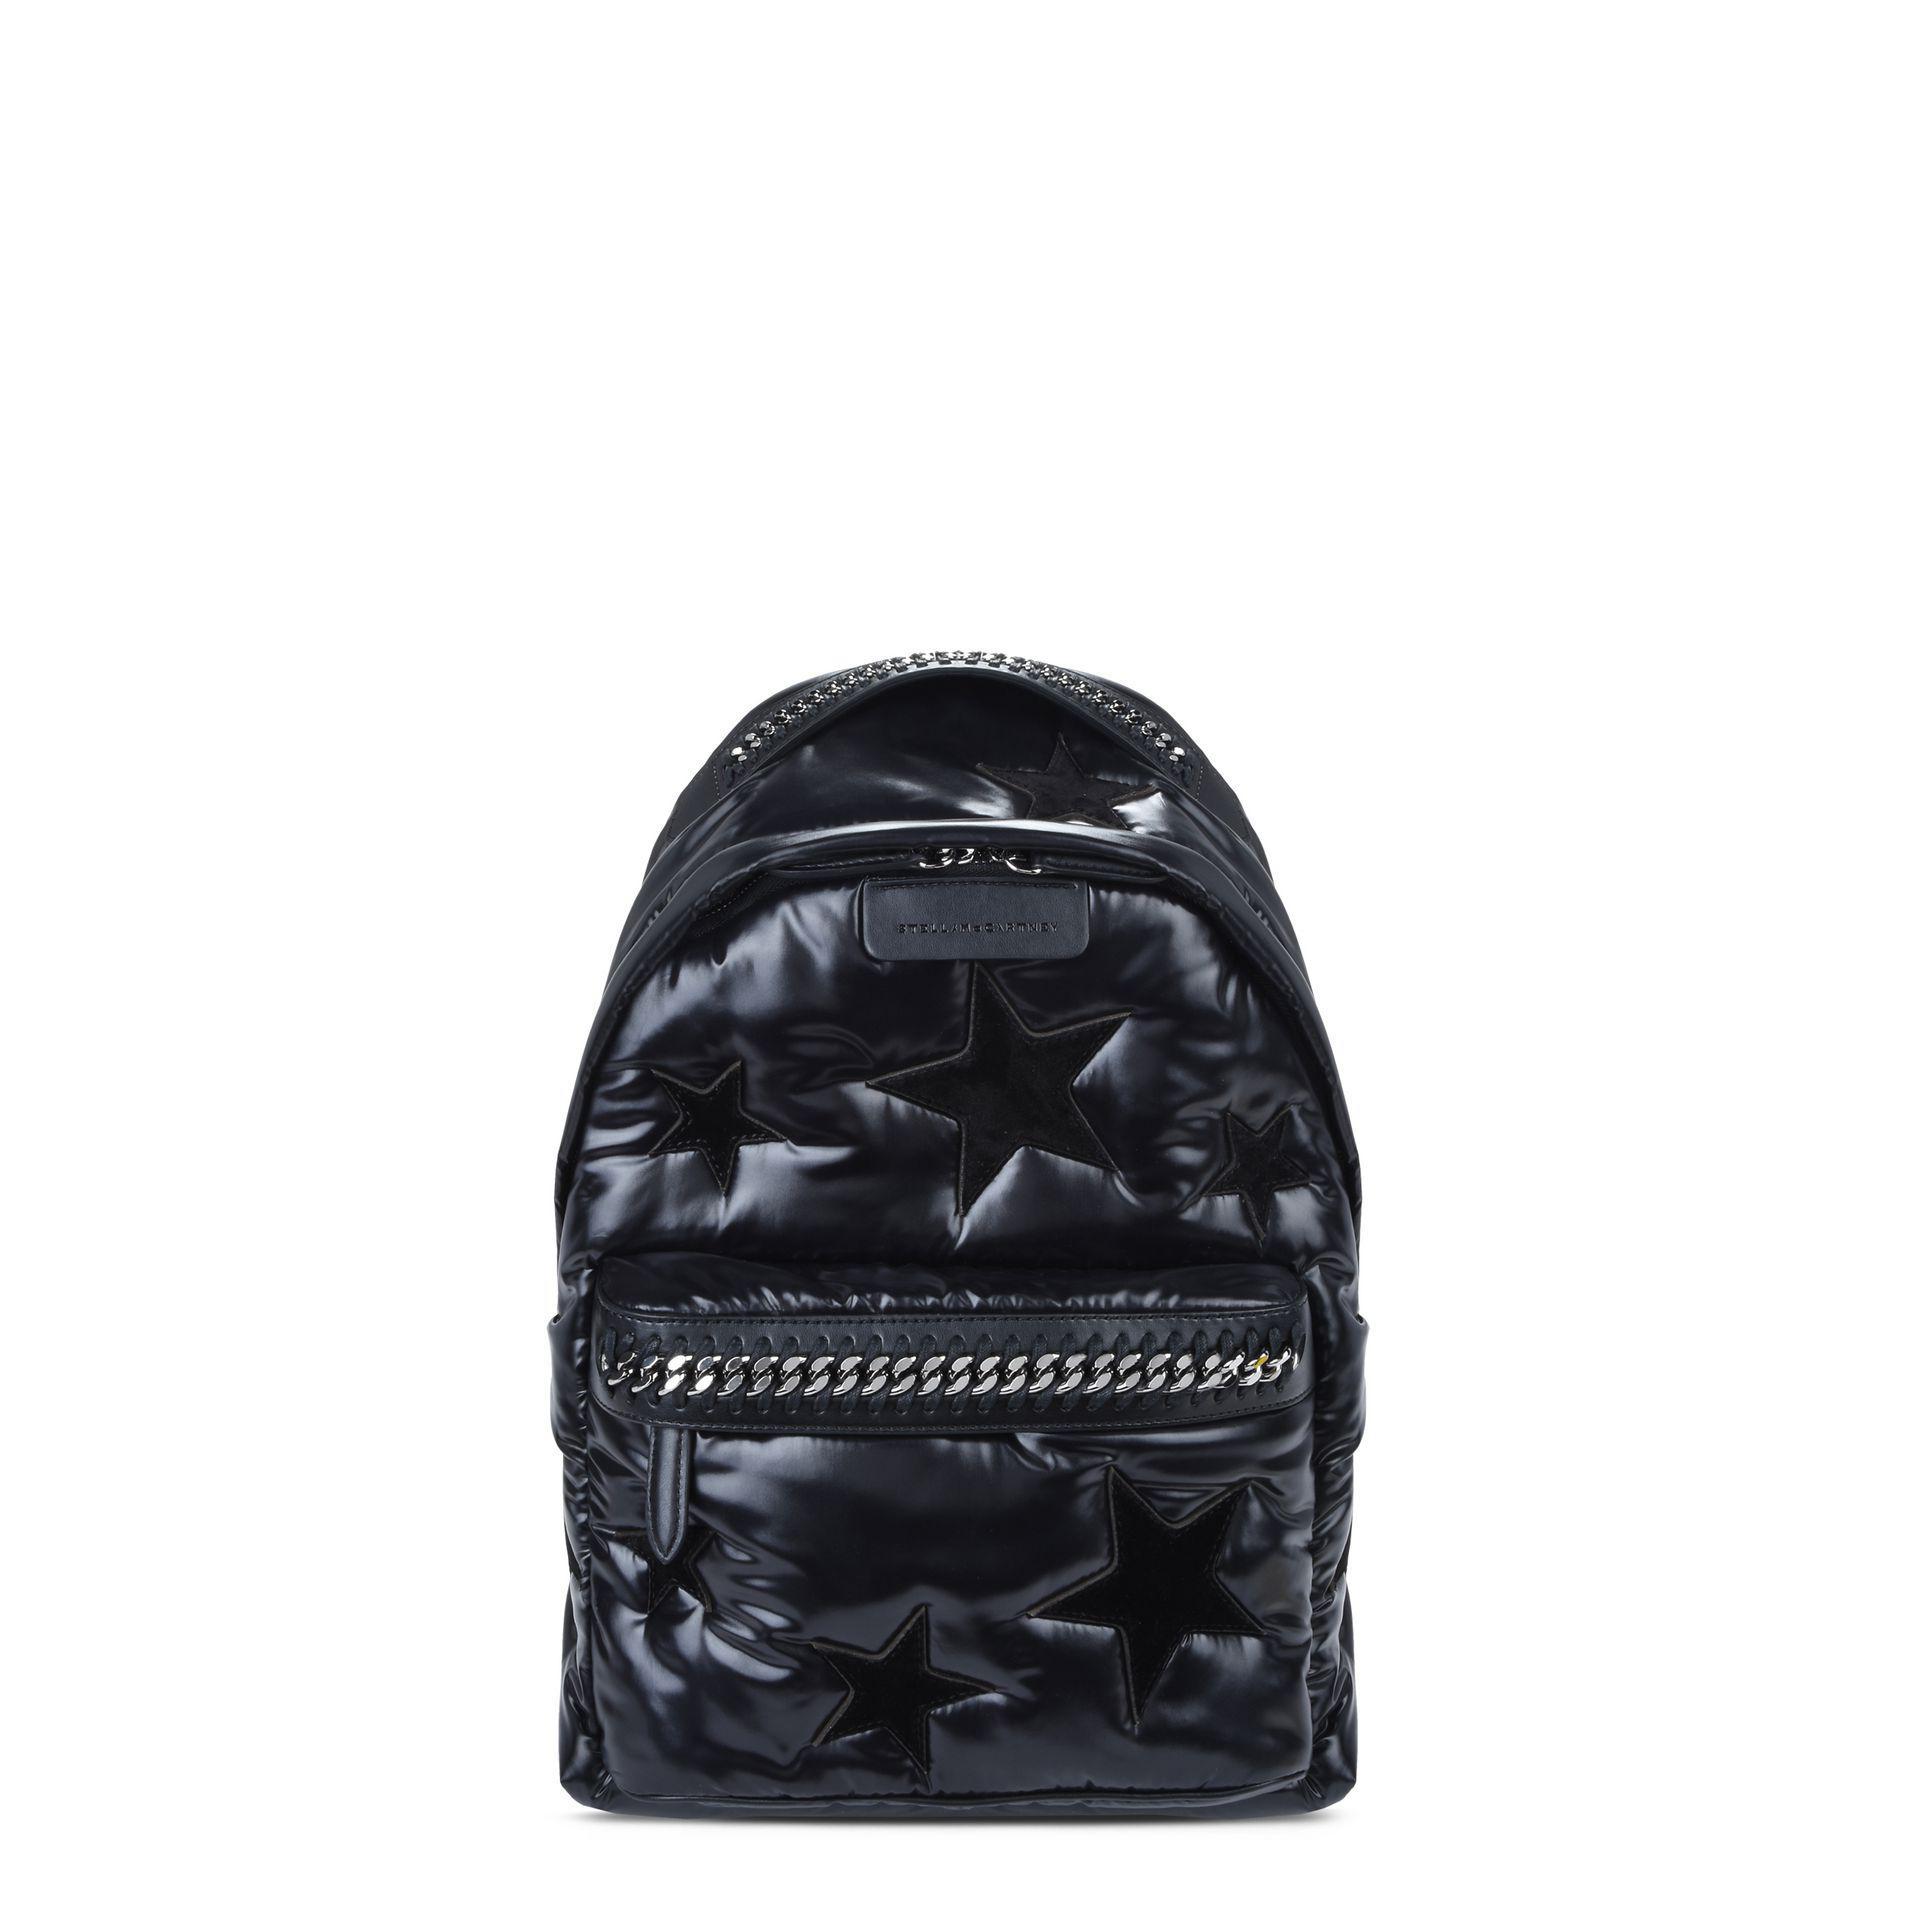 ee1098399b18 Stella Mccartney Black Stars Falabella Go Backpack in Black - Lyst